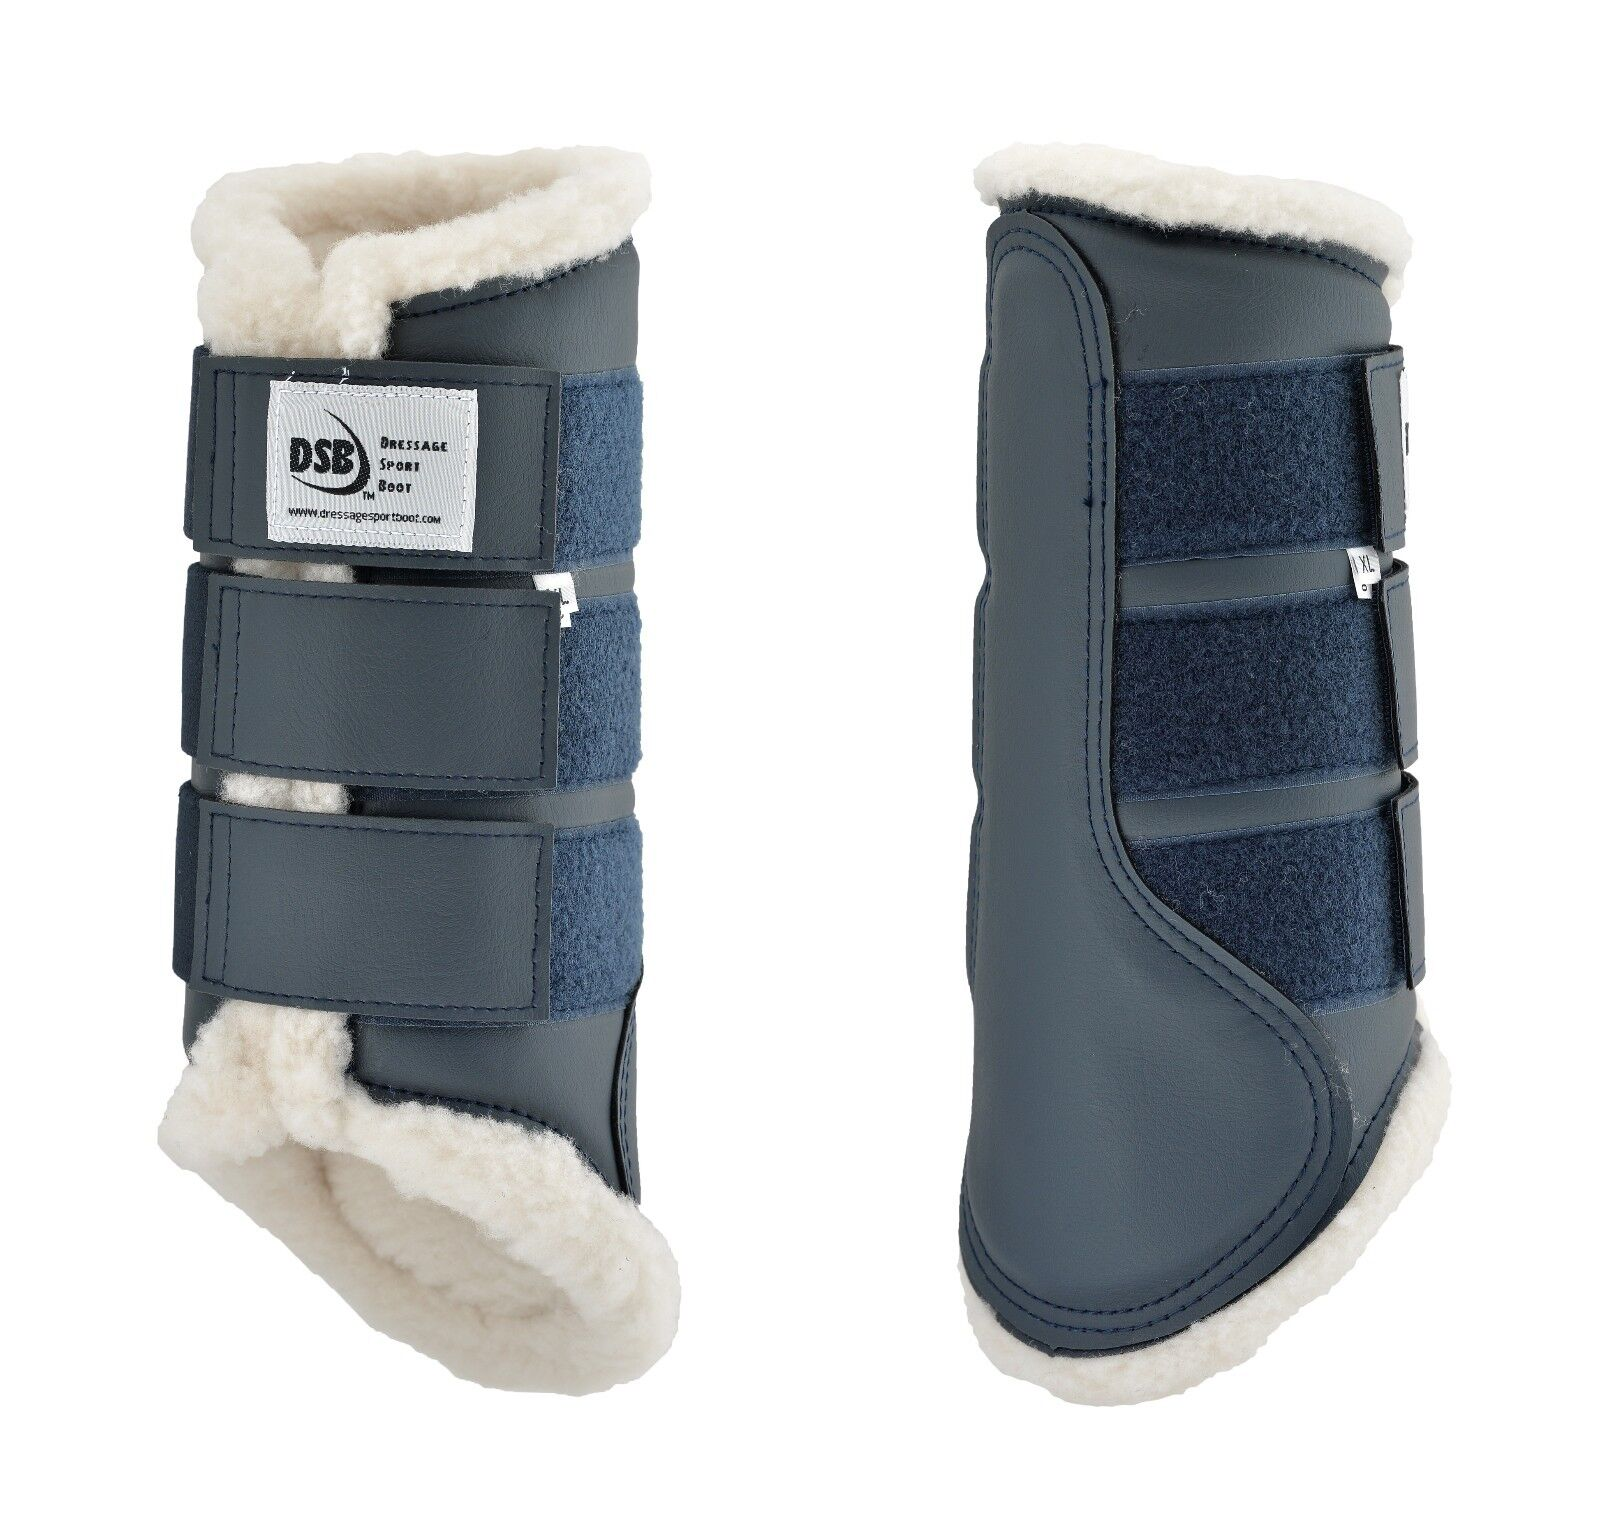 DSB Dressage Sport Fleece Boots - Navy - Different Sizes